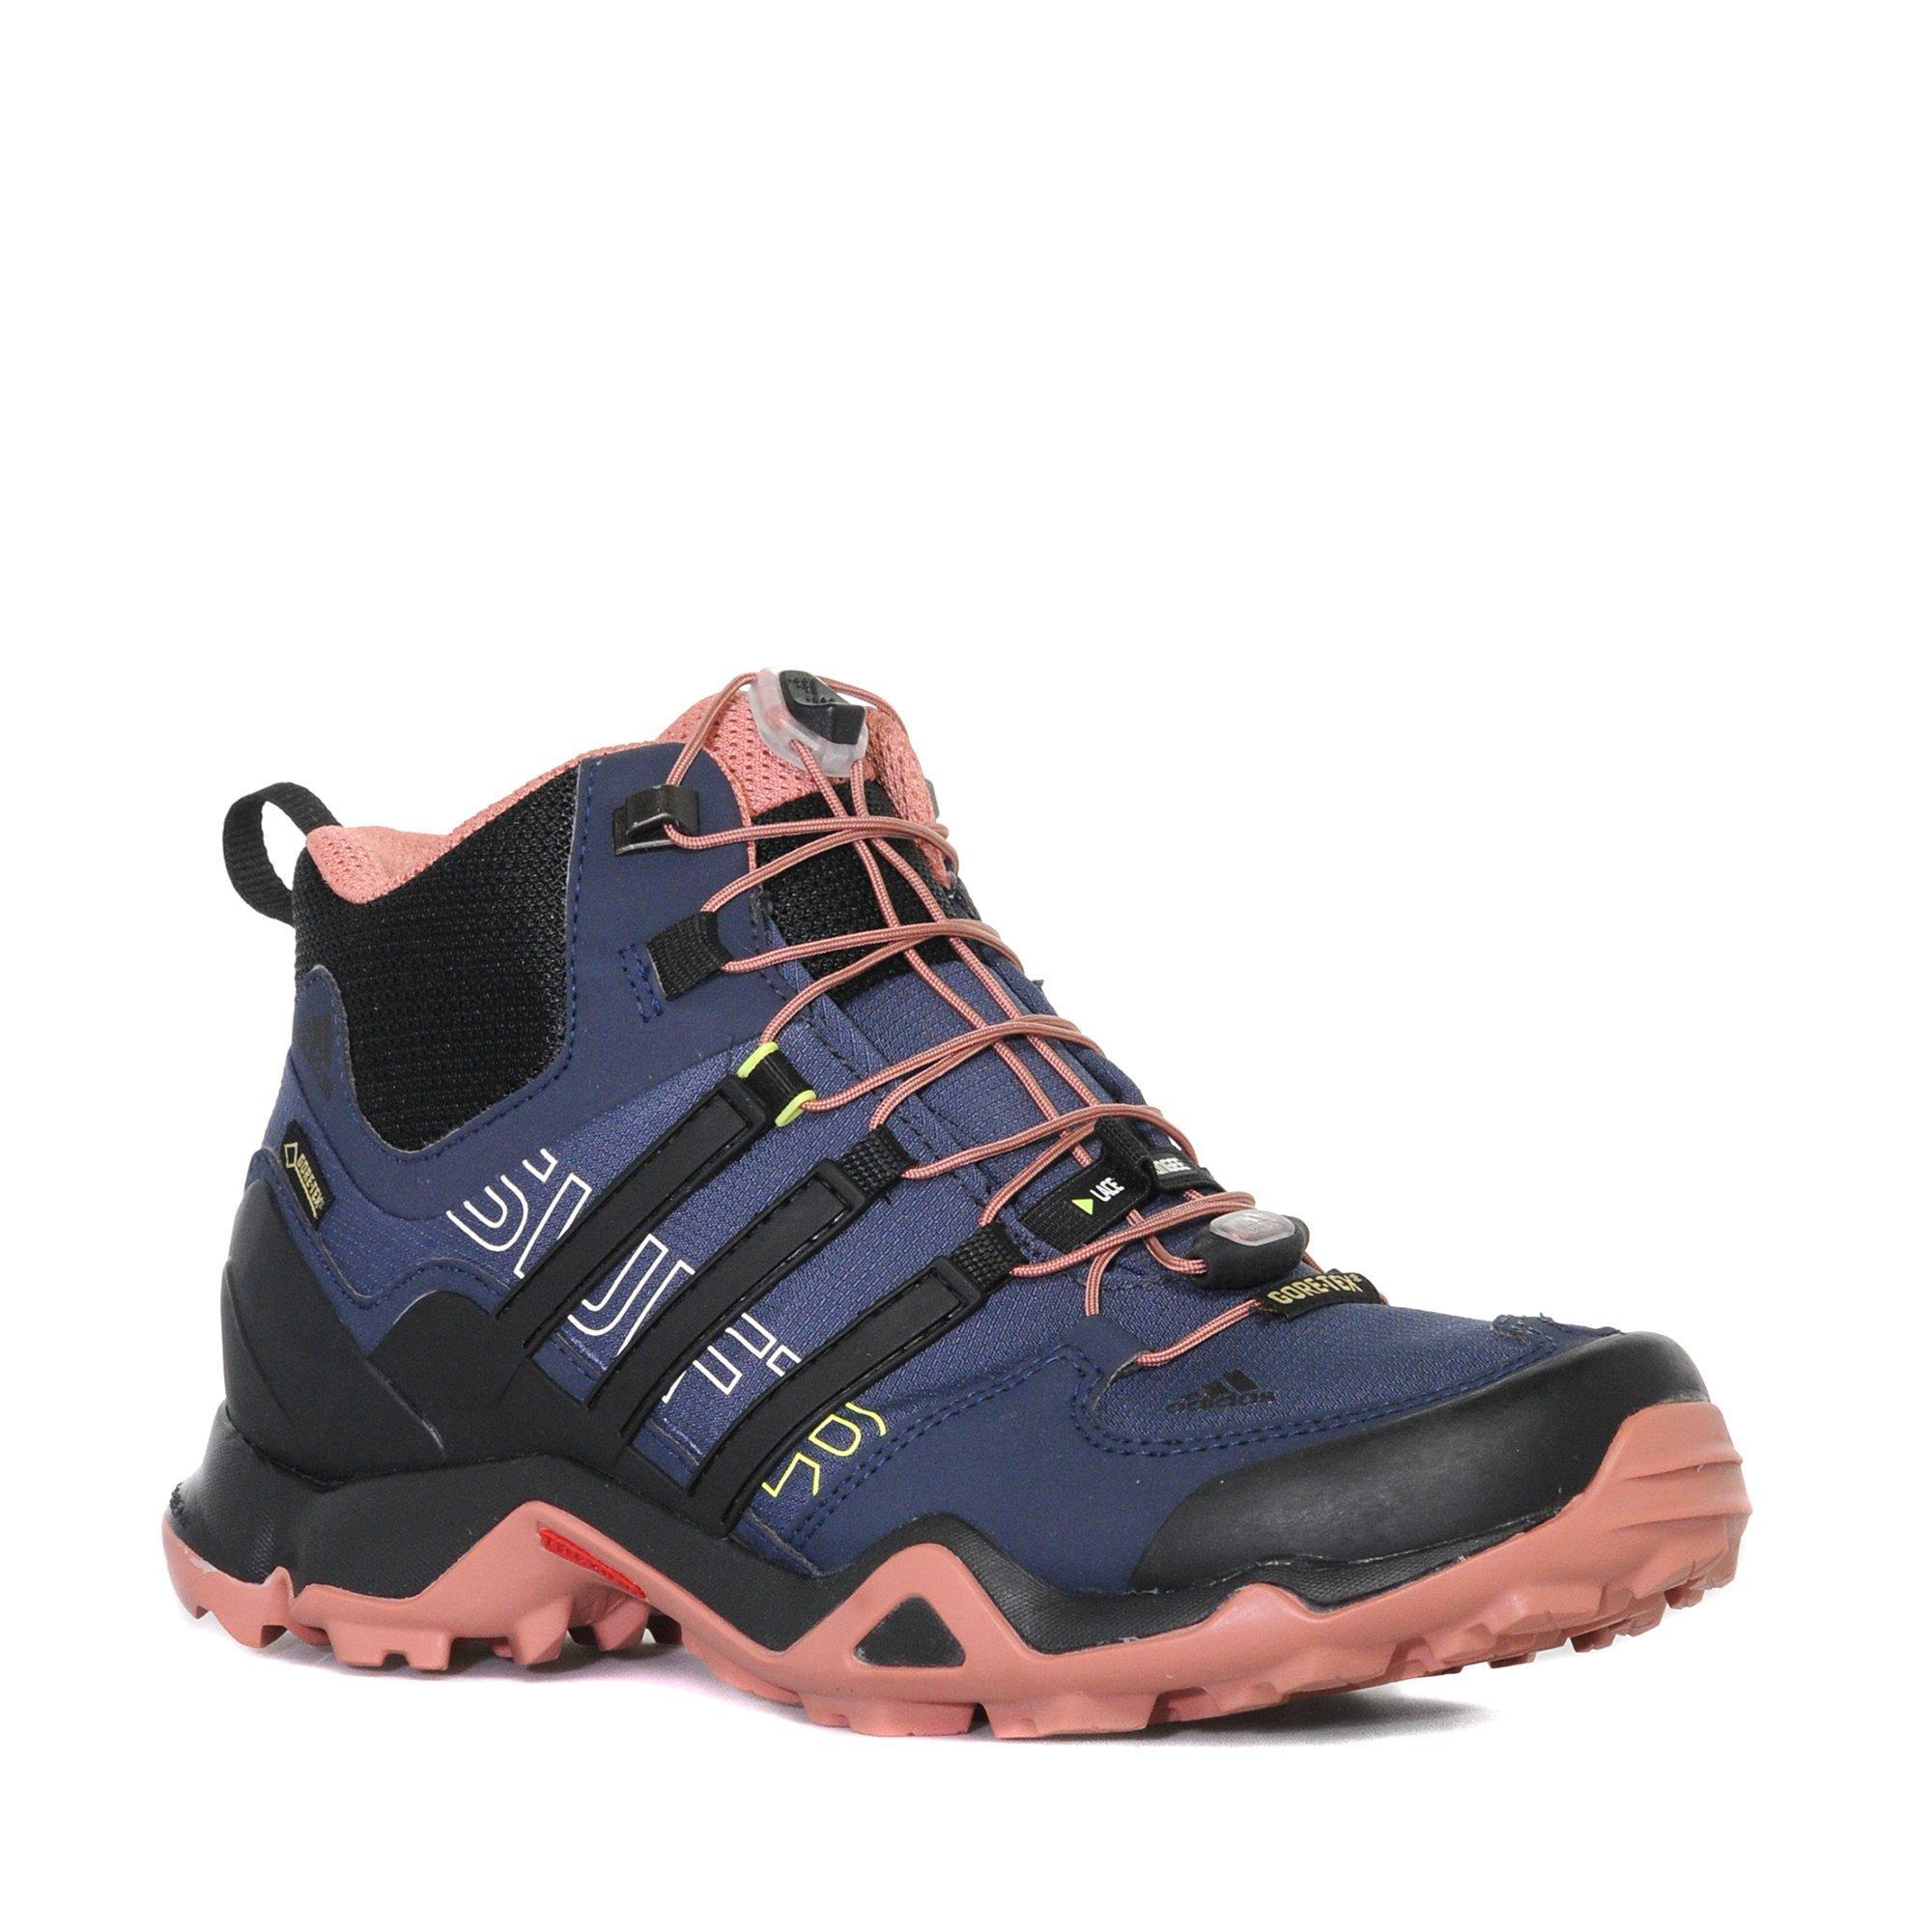 Adidas Womens Terrex Swift R GORETEX Mid Boot Grey